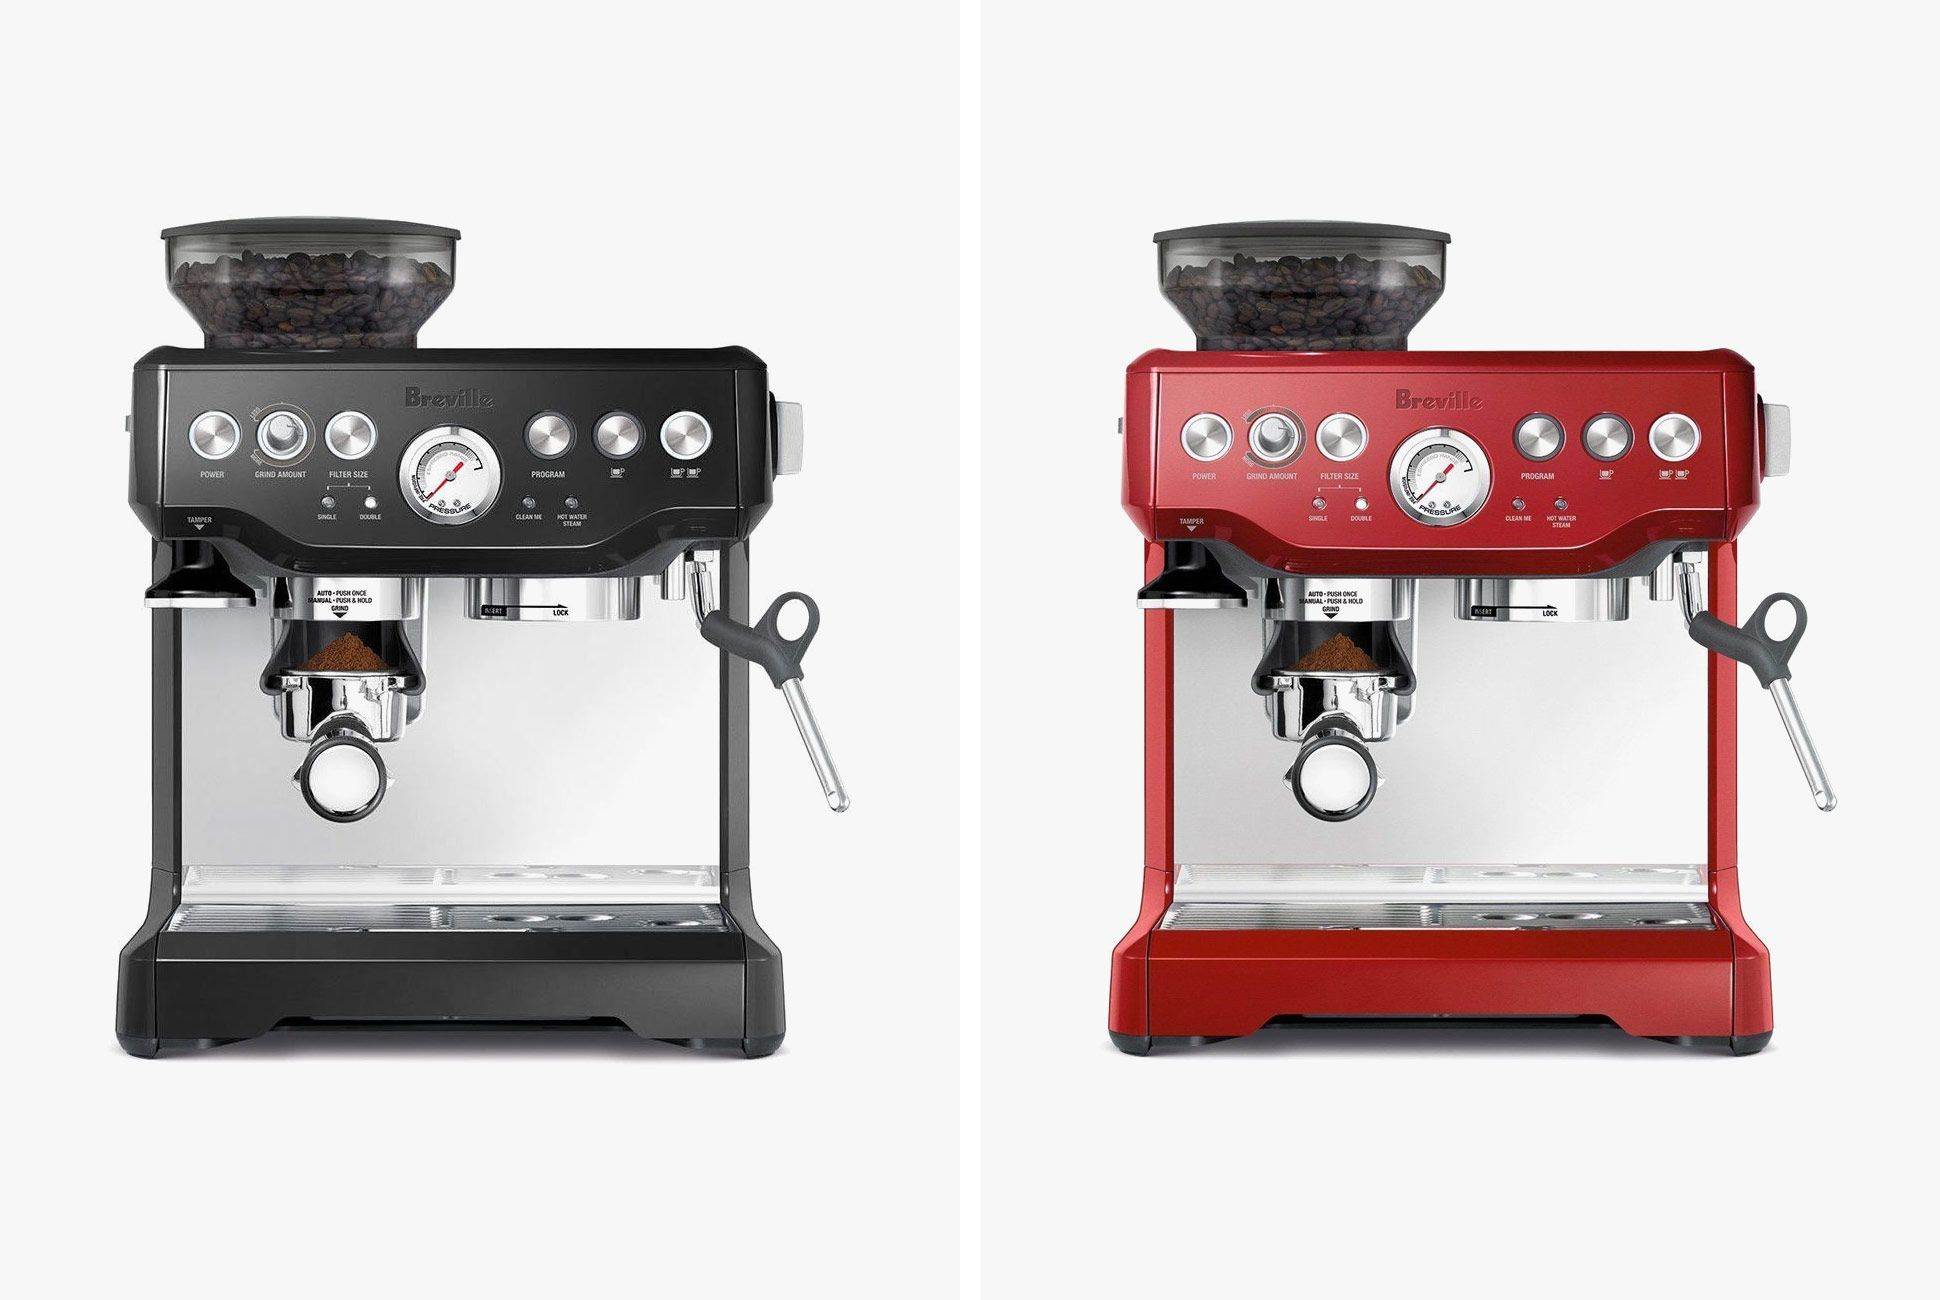 Save 140 On This Excellent Home Espresso Machine Gear Patrol